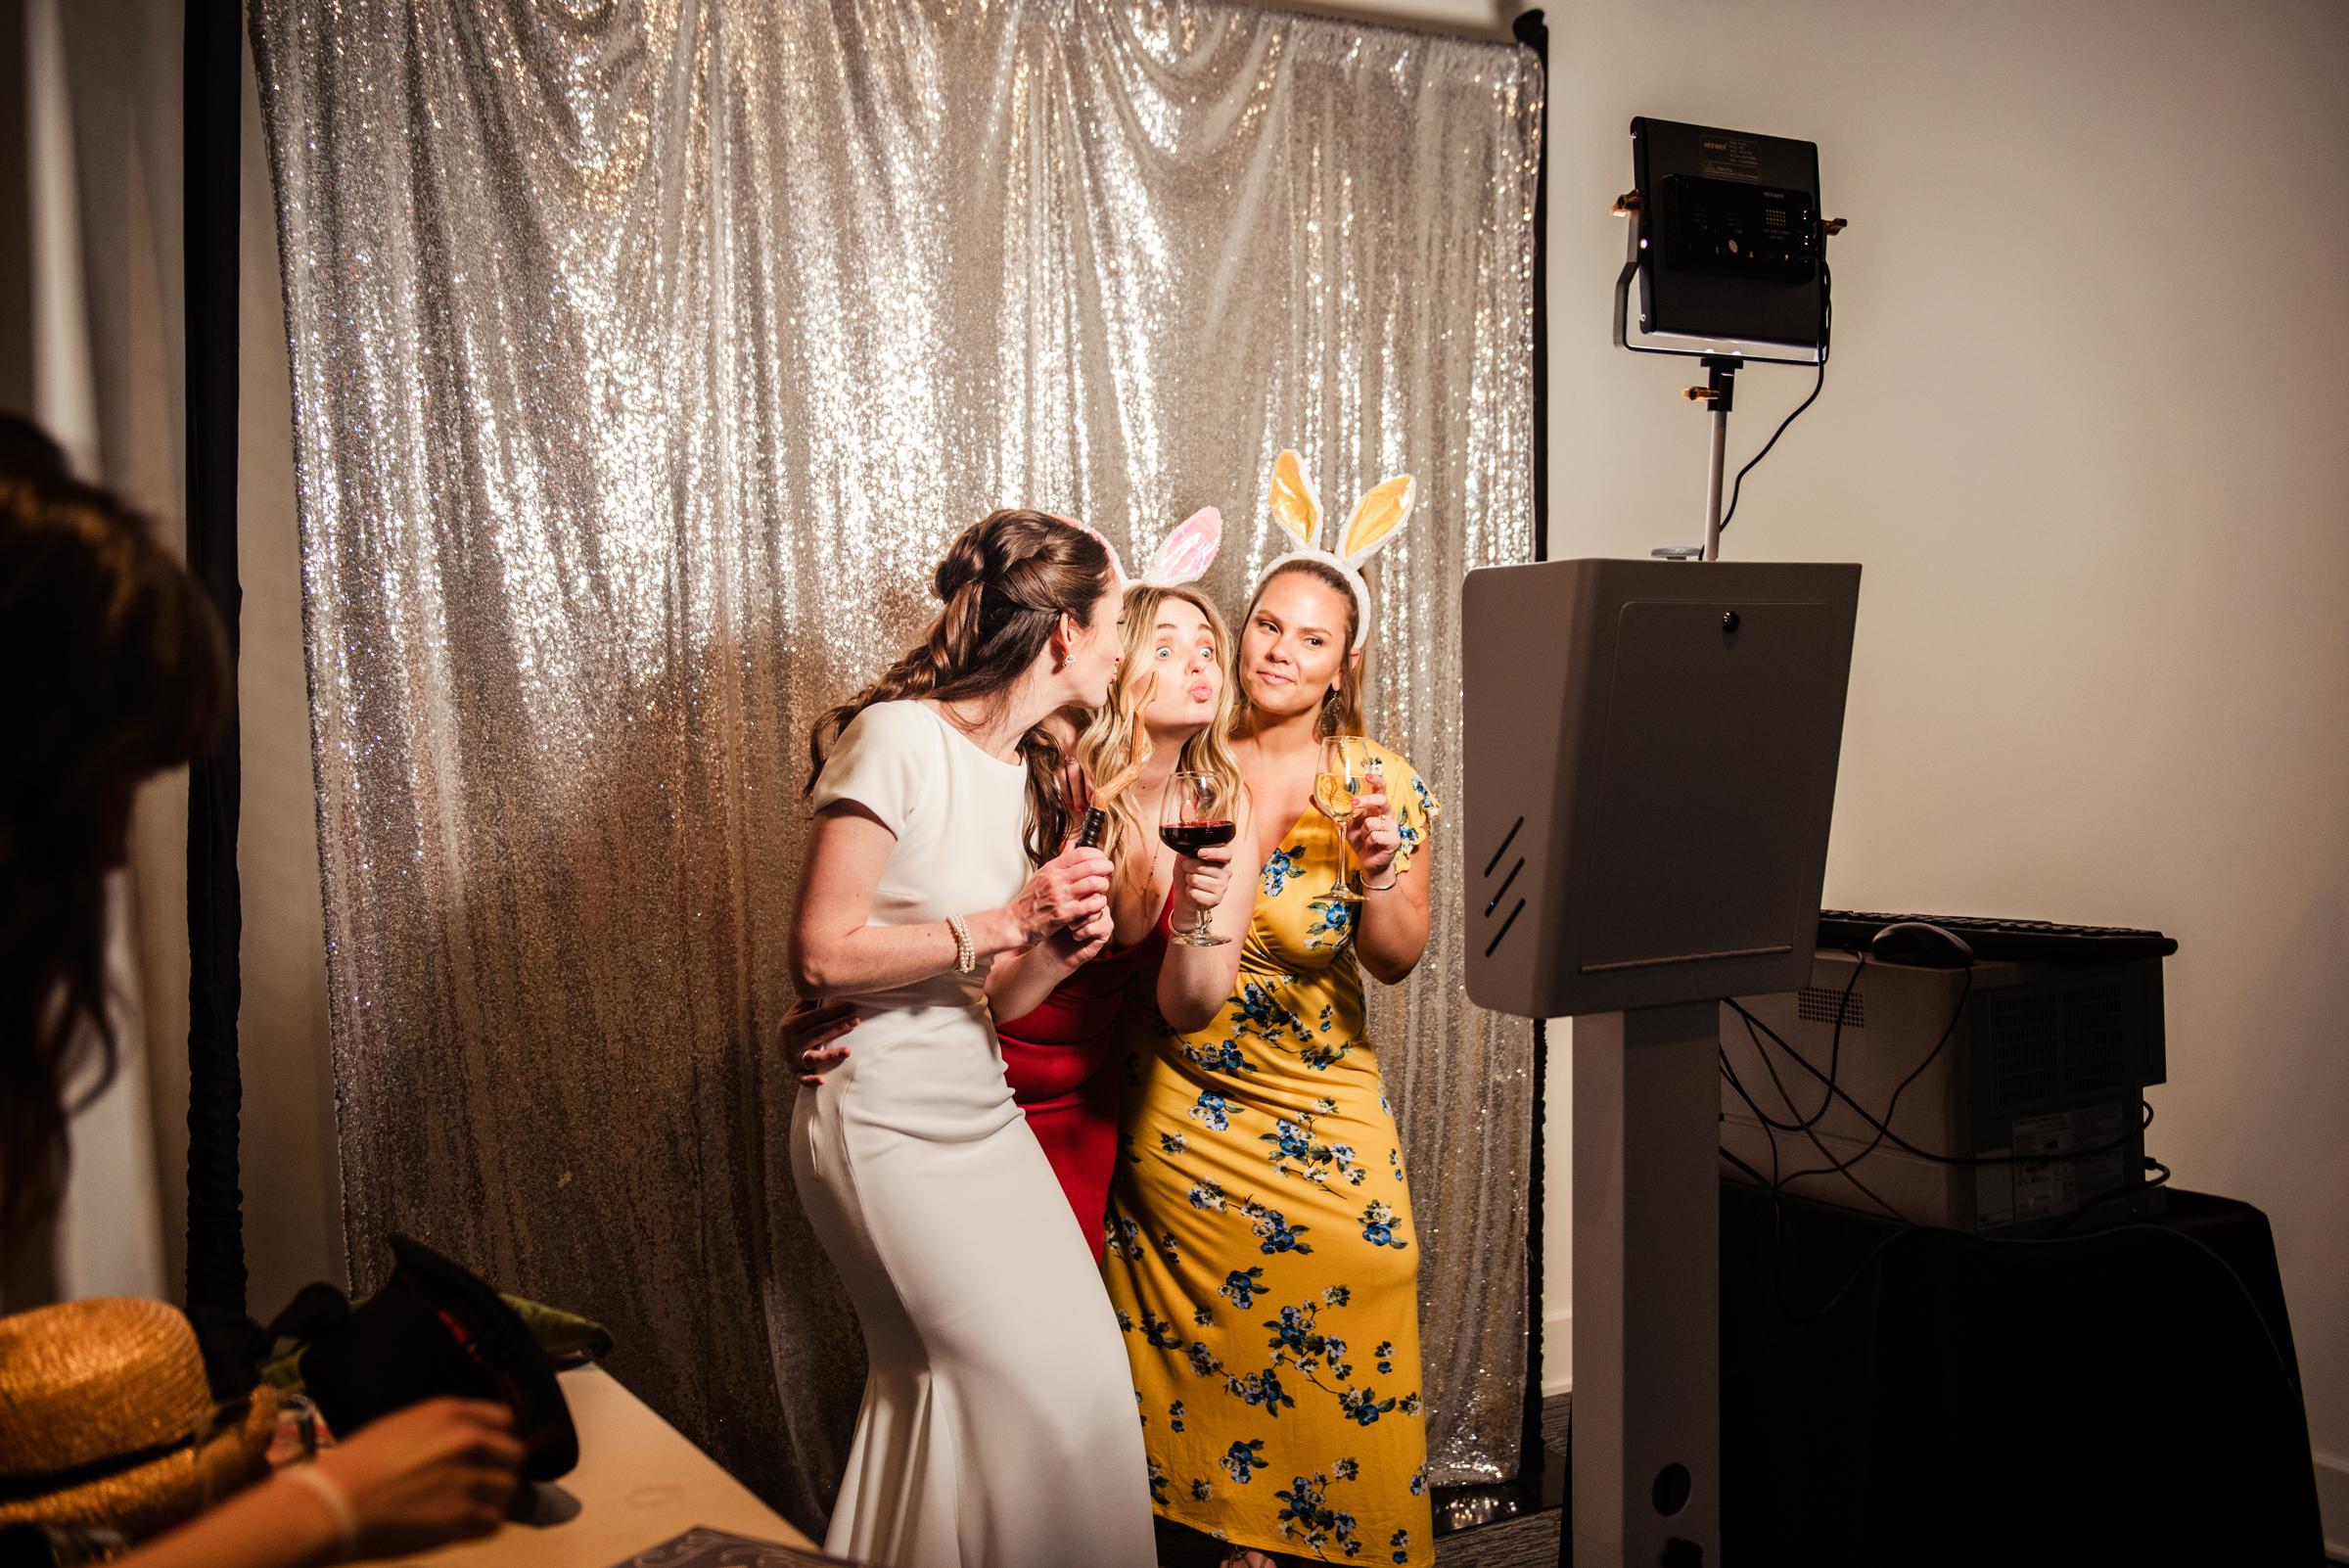 SKY_Armory_Syracuse_Wedding_JILL_STUDIO_Rochester_NY_Photographer_DSC_6545.jpg